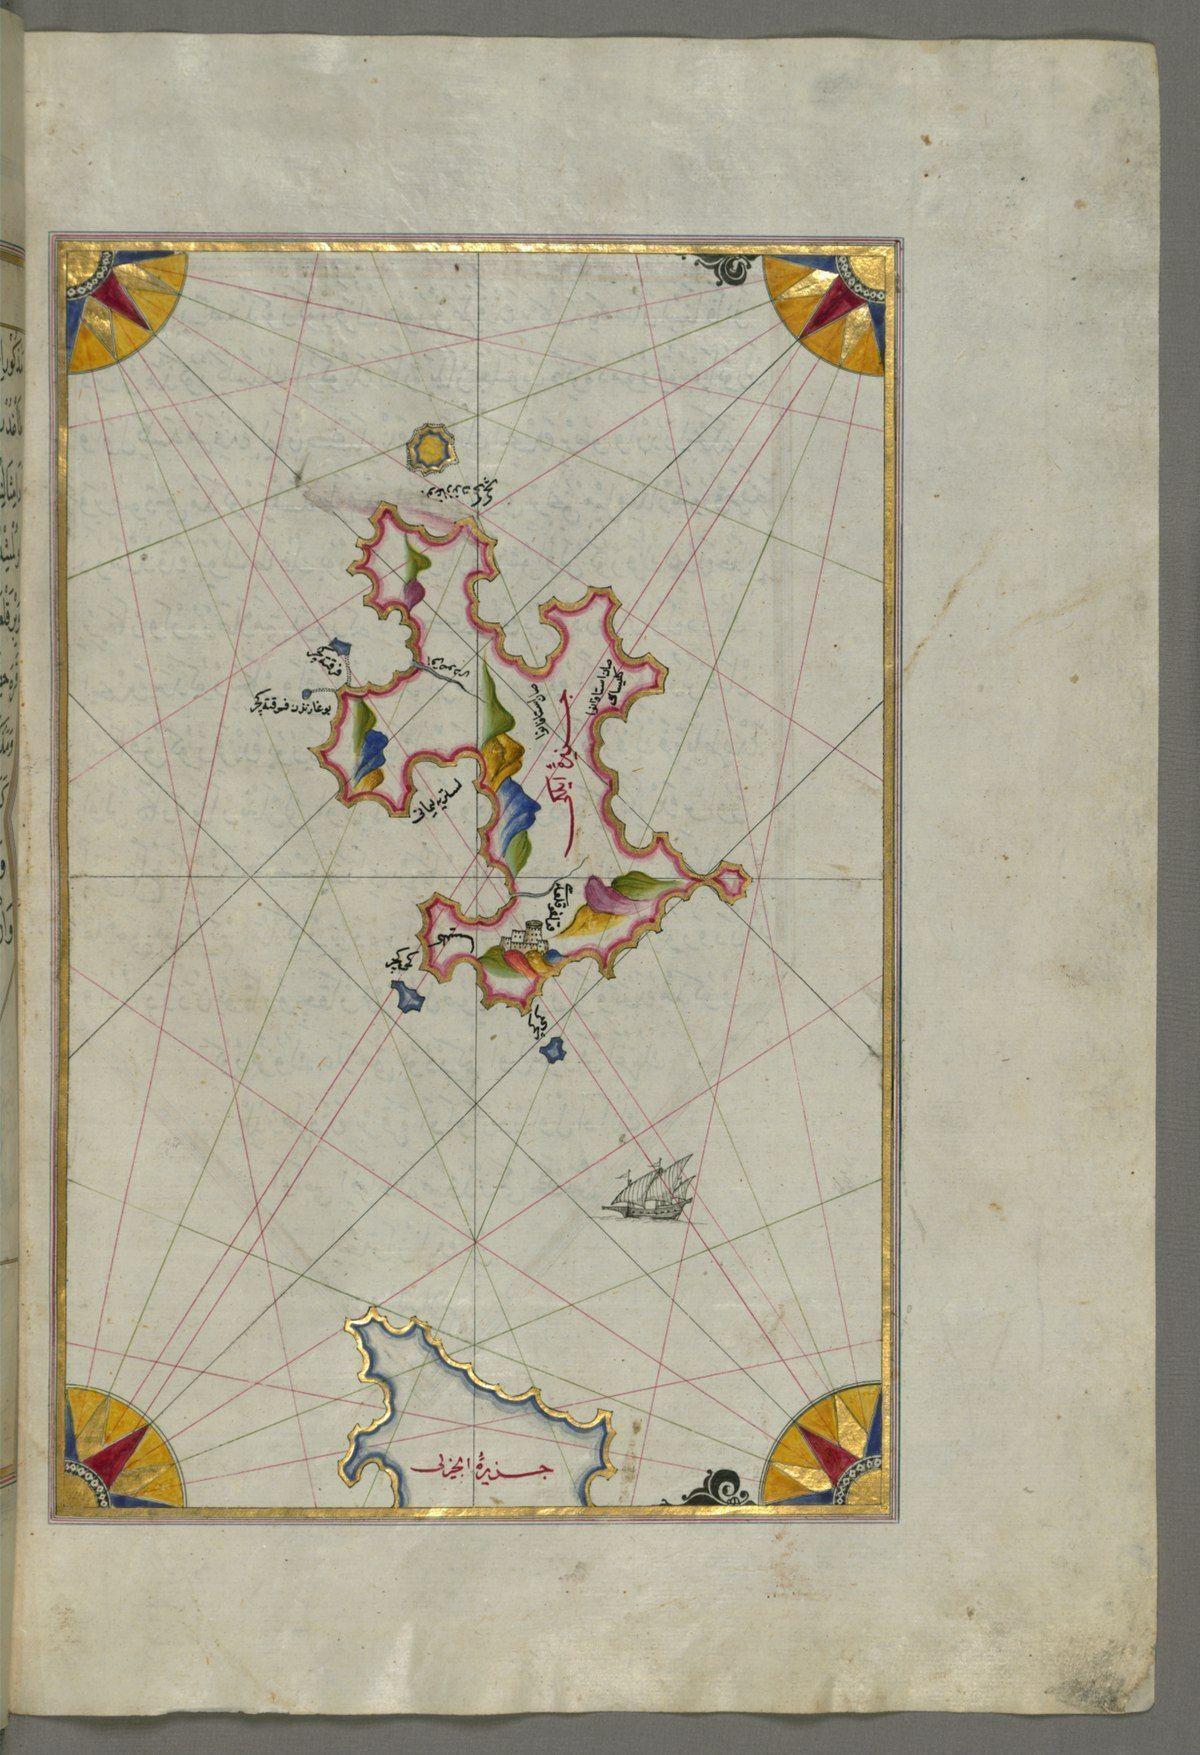 fol. 105b: Island of Telos (Episkopi, İlyaki) north of the island of Chalkis (Herke) in the eastern Aegean Sea. #aegeansea fol. 105b: Island of Telos (Episkopi, İlyaki) north of the island of Chalkis (Herke) in the eastern Aegean Sea. #aegeansea fol. 105b: Island of Telos (Episkopi, İlyaki) north of the island of Chalkis (Herke) in the eastern Aegean Sea. #aegeansea fol. 105b: Island of Telos (Episkopi, İlyaki) north of the island of Chalkis (Herke) in the eastern Aegean Sea. #aegeansea fol. #aegeansea